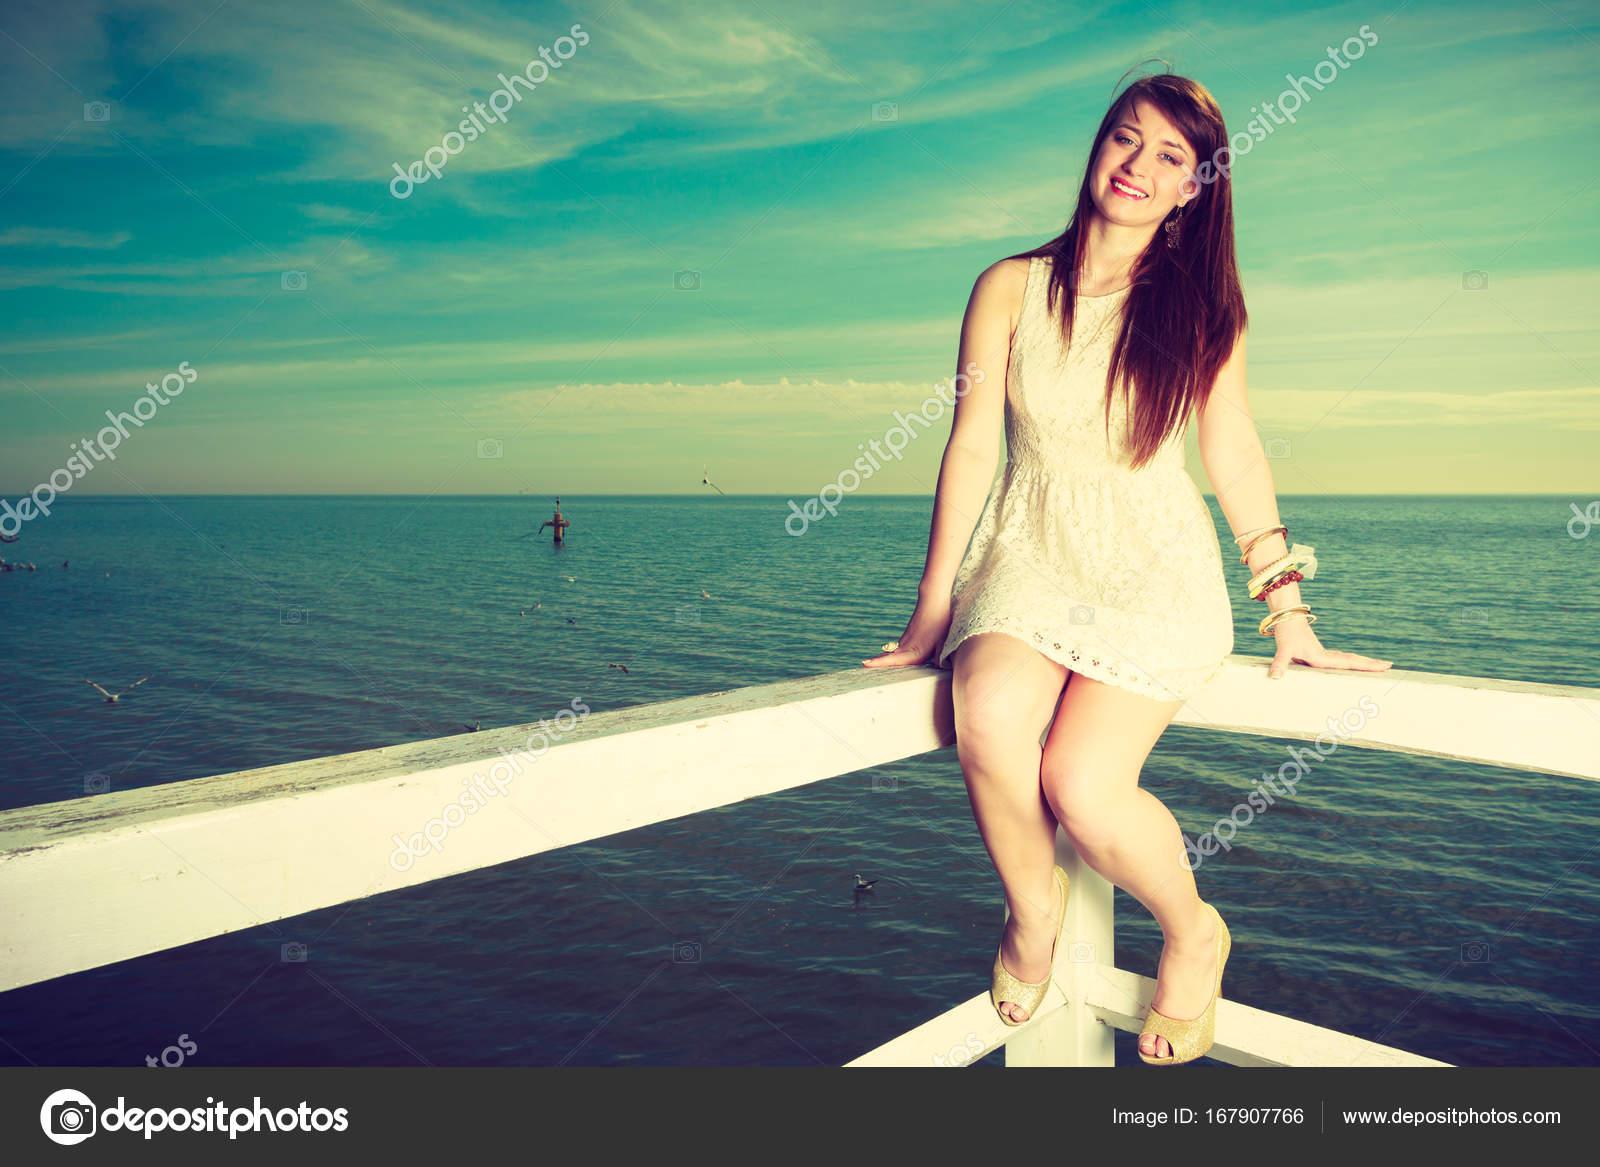 947713baa0f7 Γυναίκα με λευκό κοντό φόρεμα κάθεται στο εμπόδιο — Φωτογραφία Αρχείου